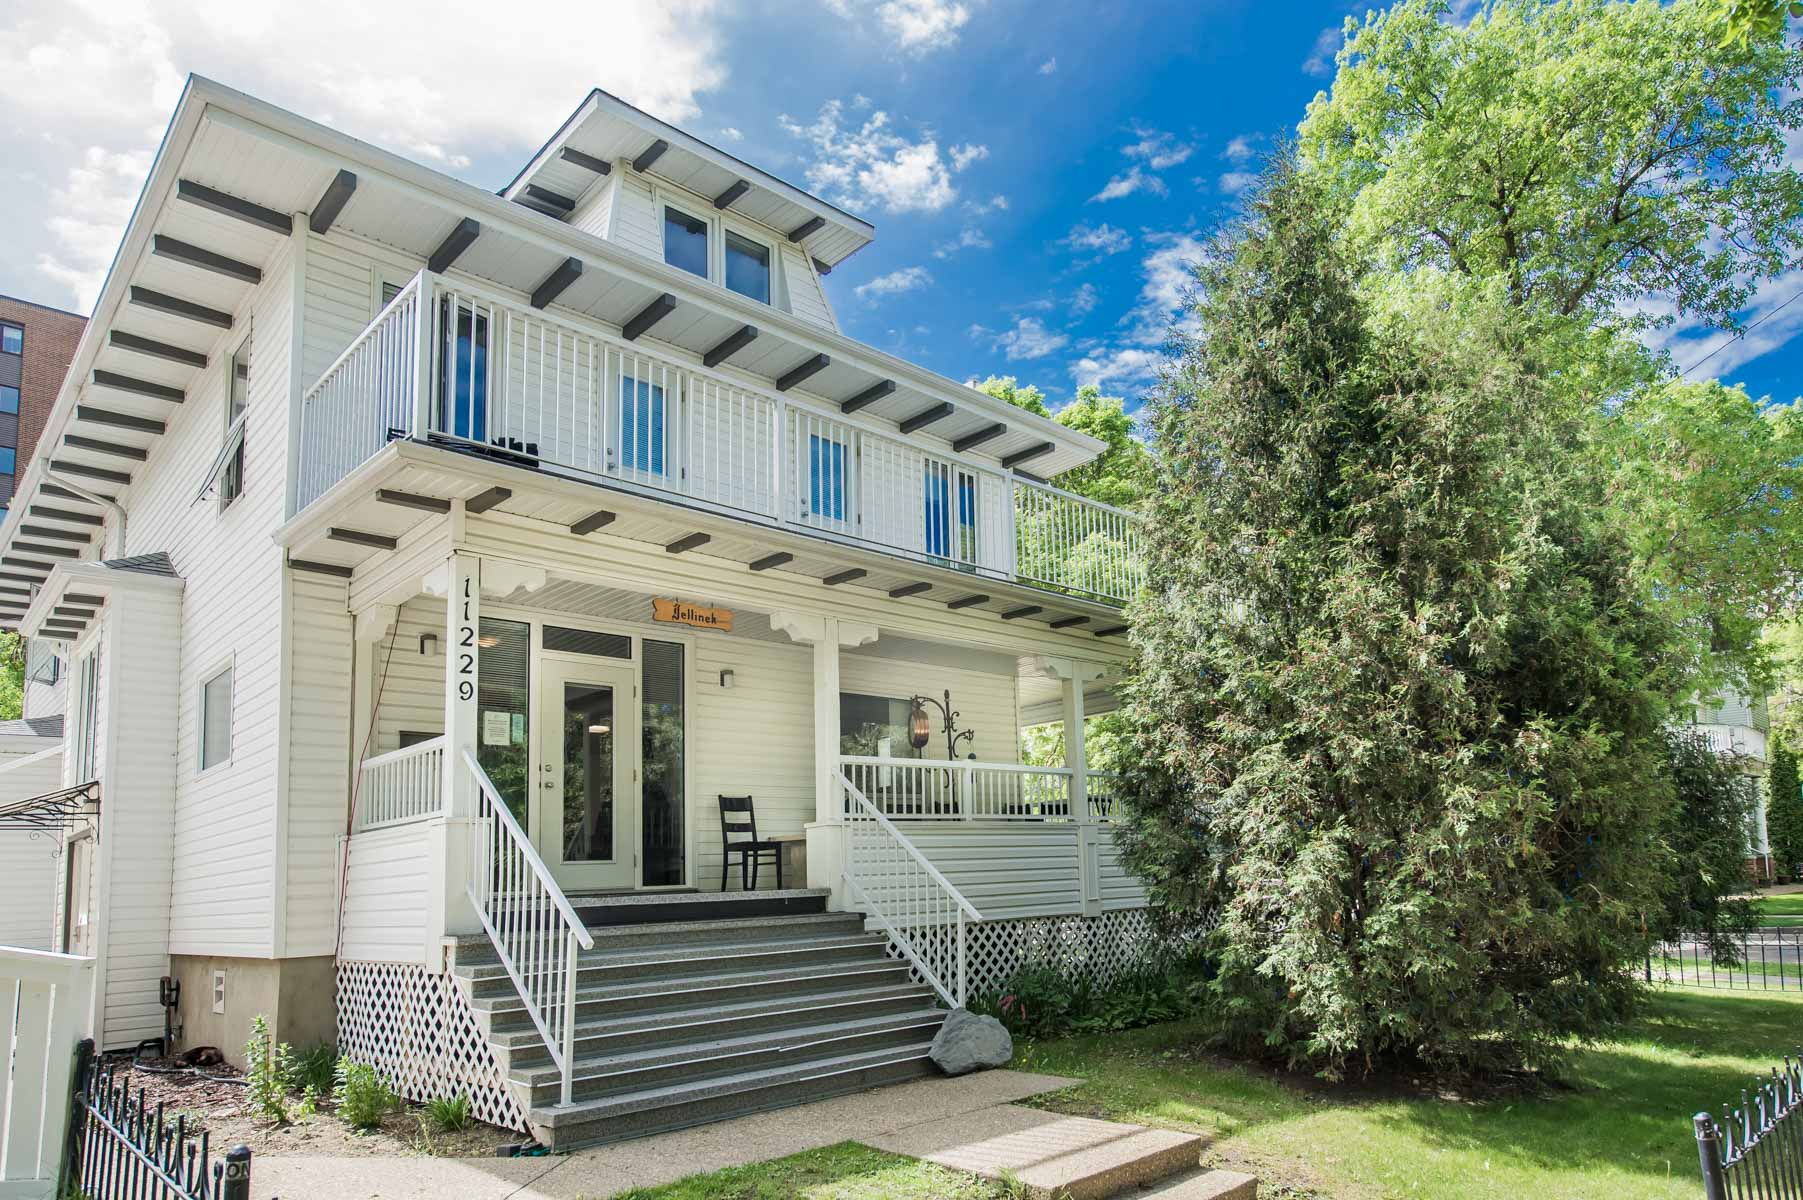 Exterior - Jellinek Society House